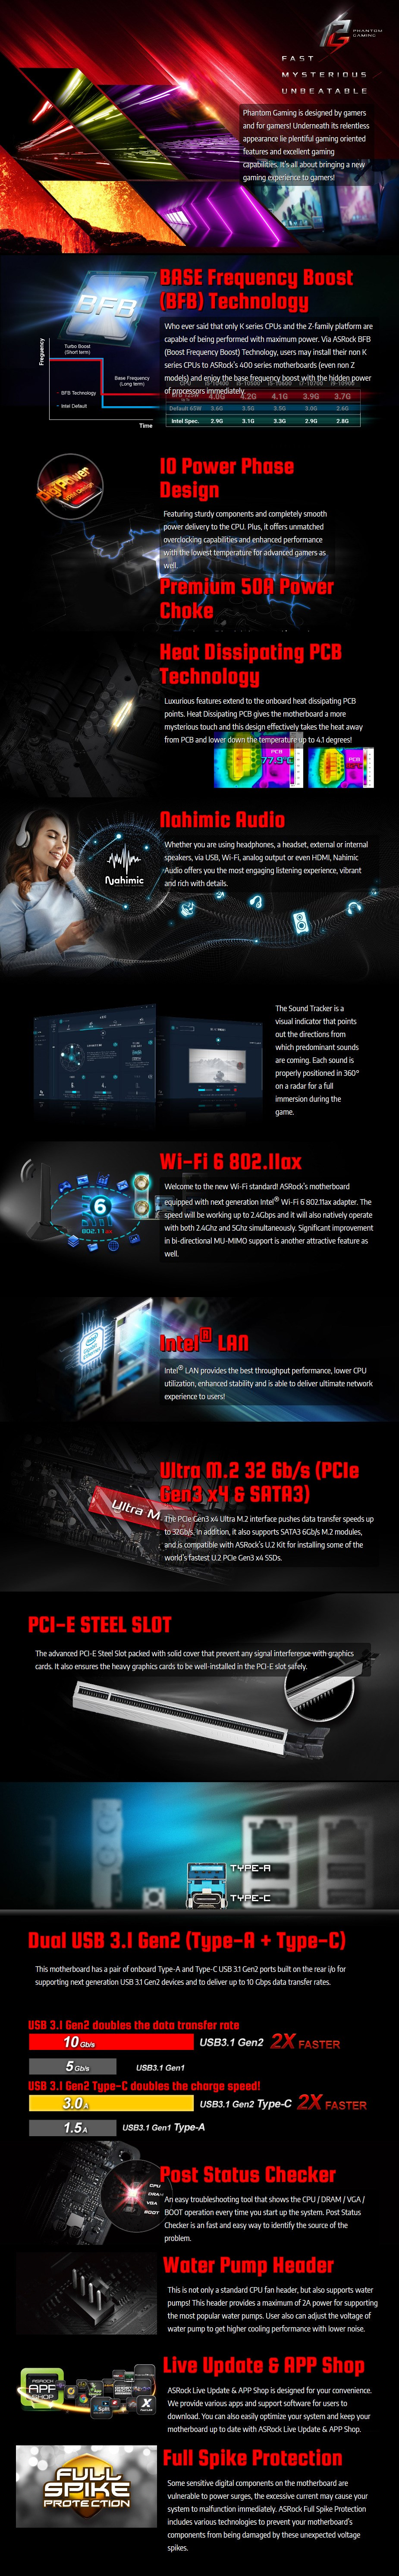 ASRock Z490 Phantom Gaming 4/ax LGA 1200 ATX Motherboard - Overview 1